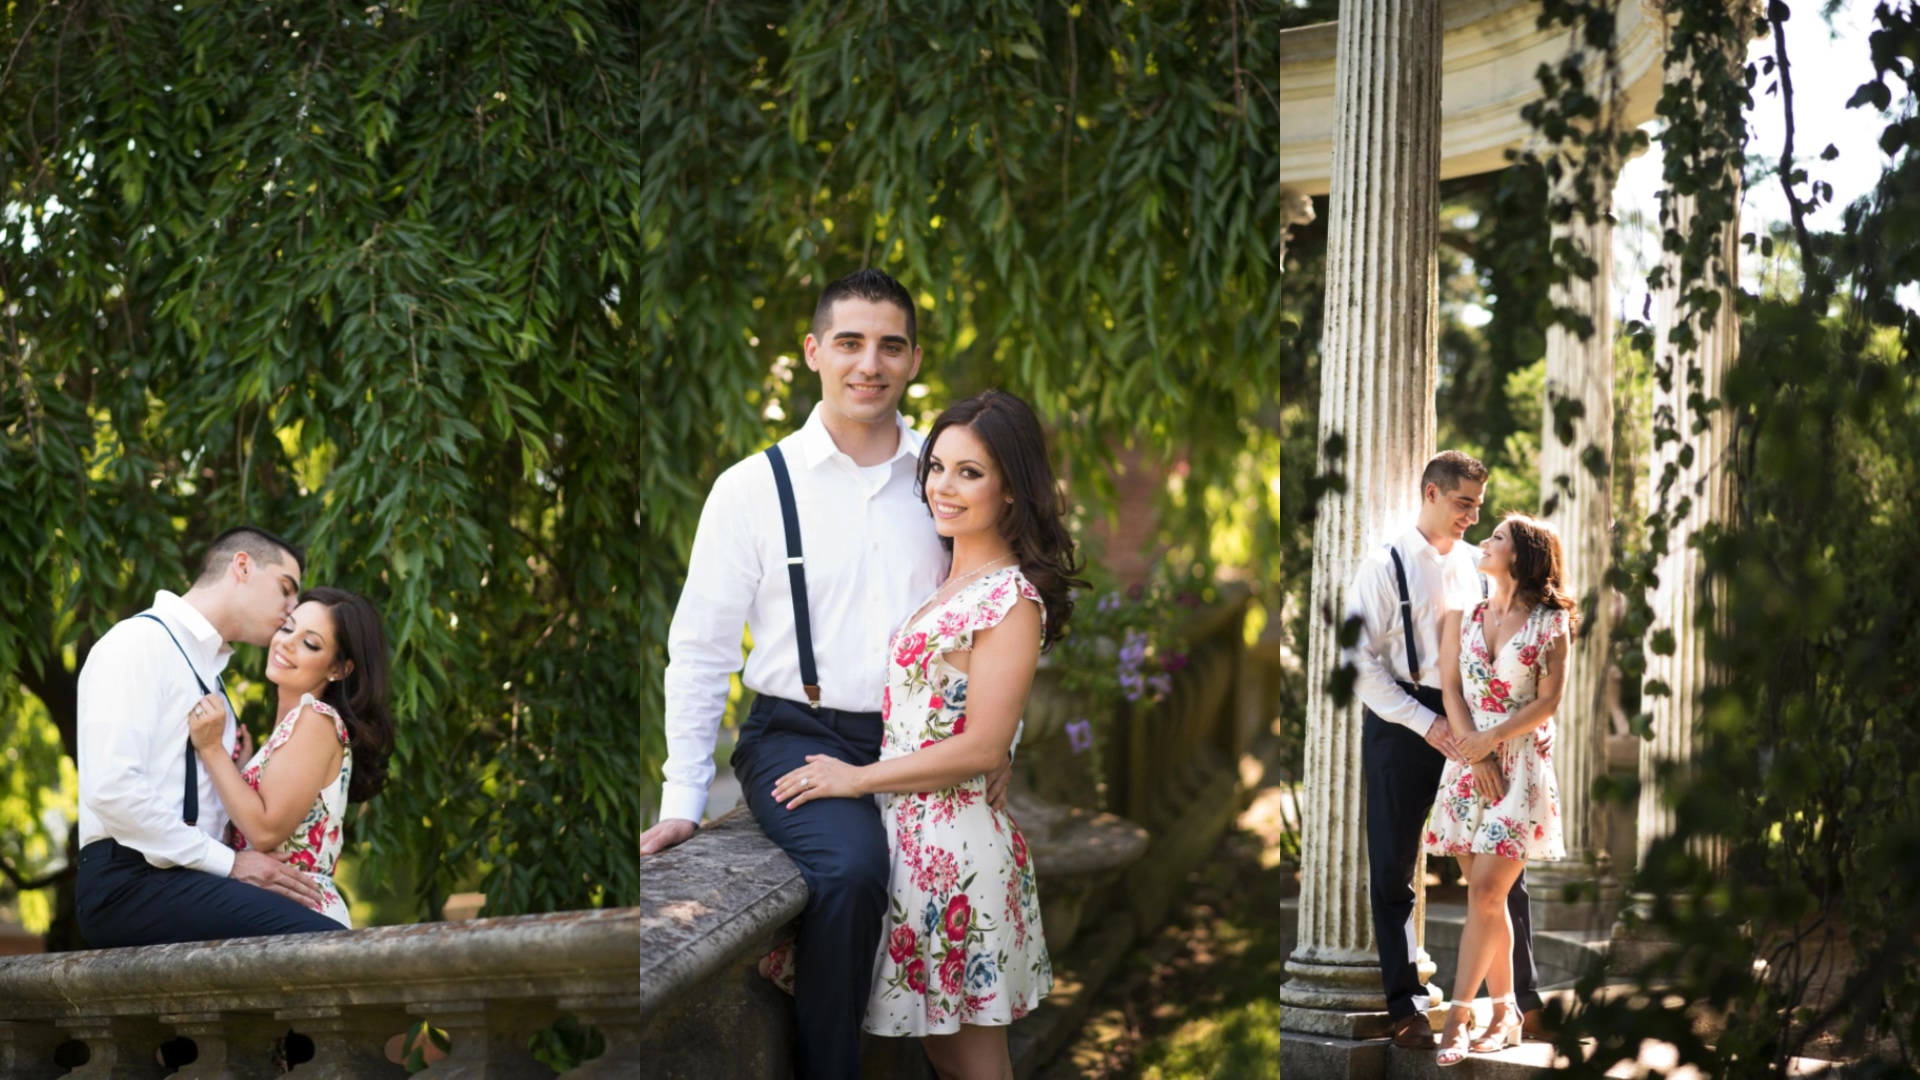 2020_Old_Westbury_Gardens_Engagement_Photos_1080p